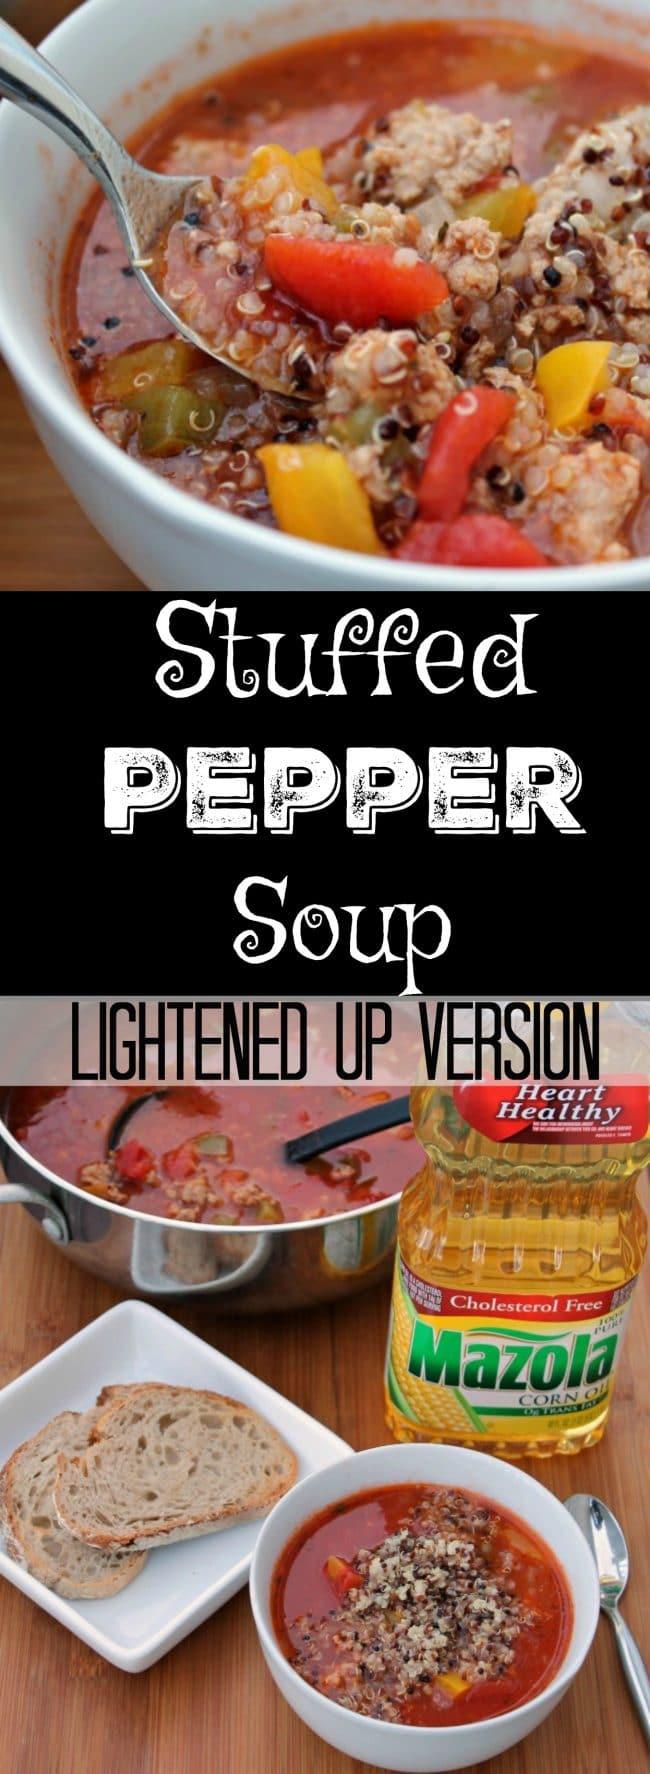 Stuffed Pepper Soup Lightened Up